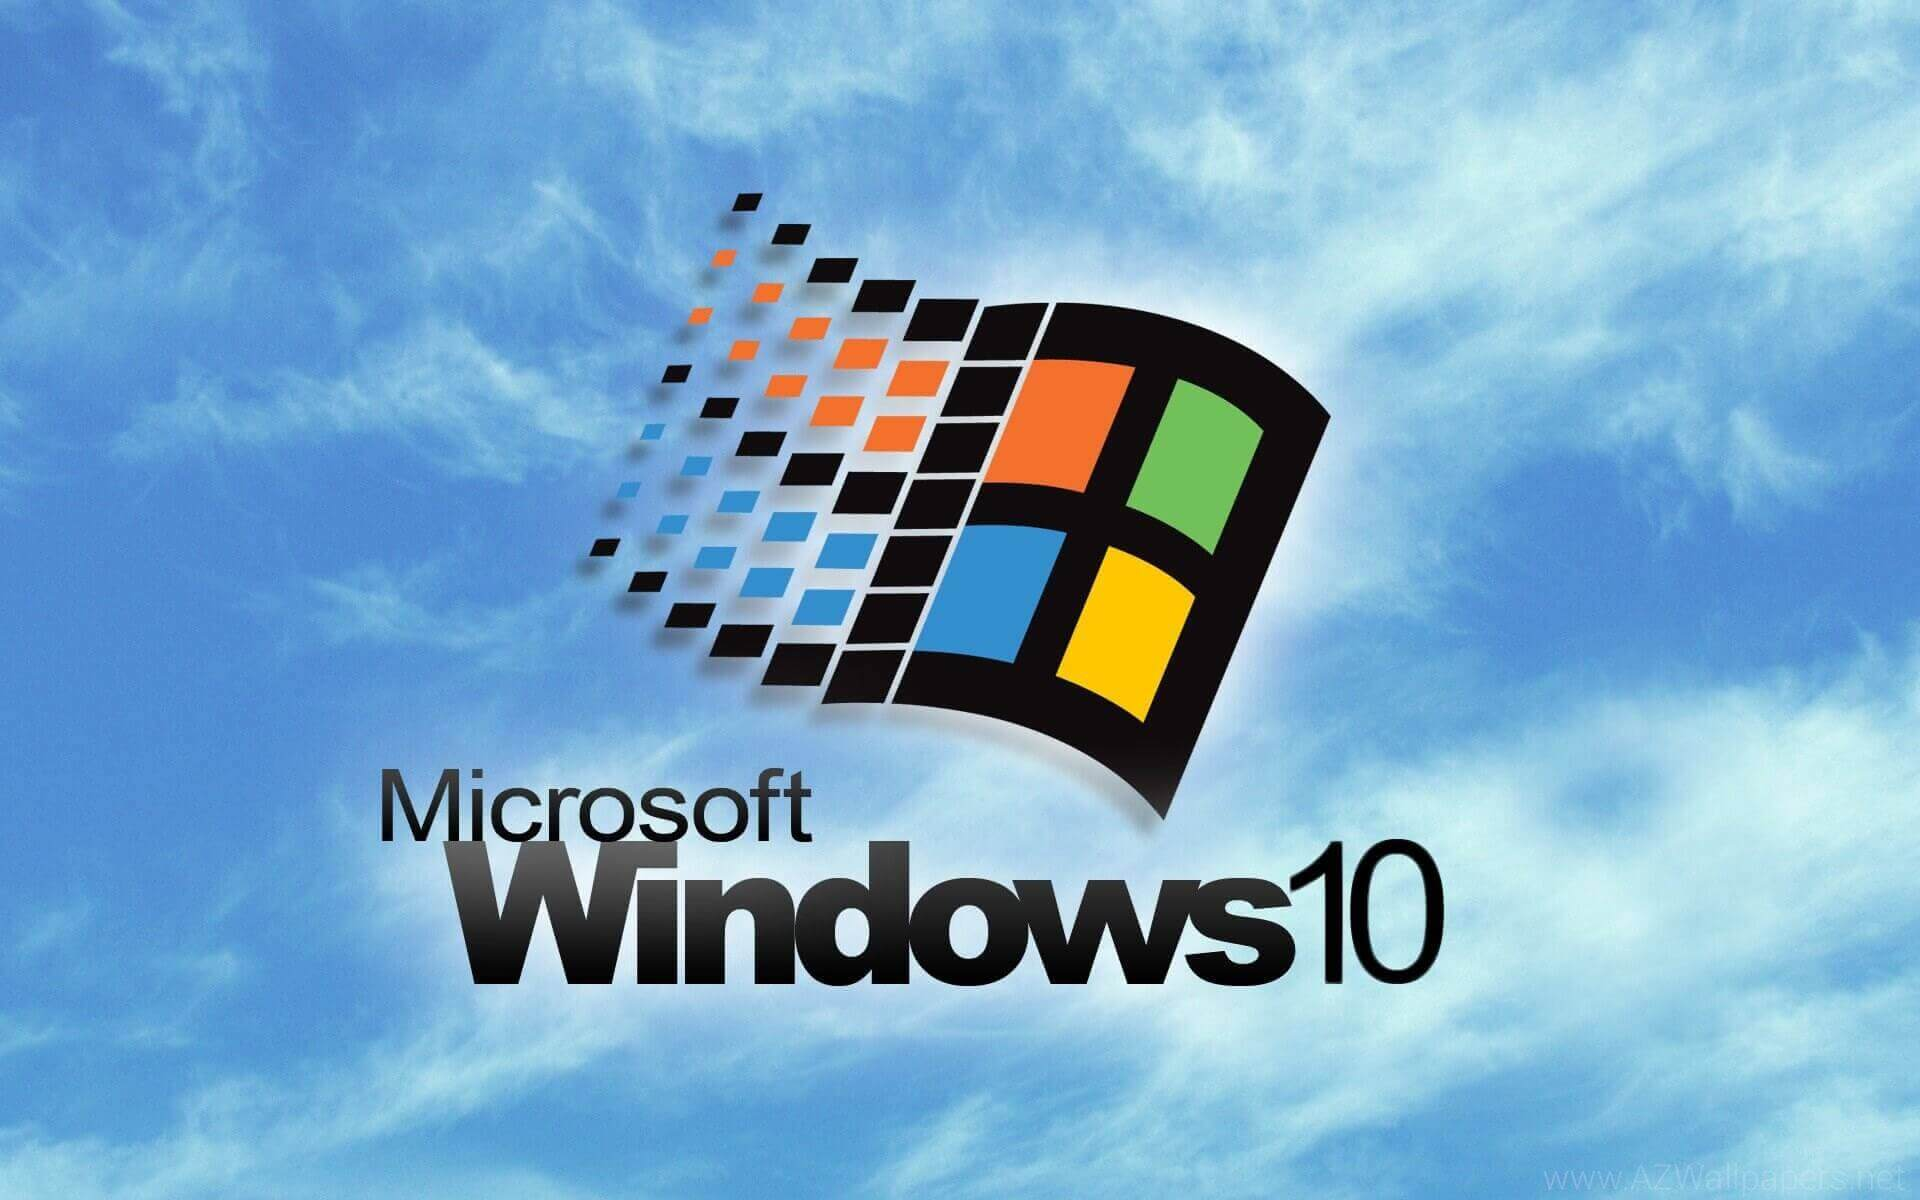 Windows 98 default wallpaper for windows 10